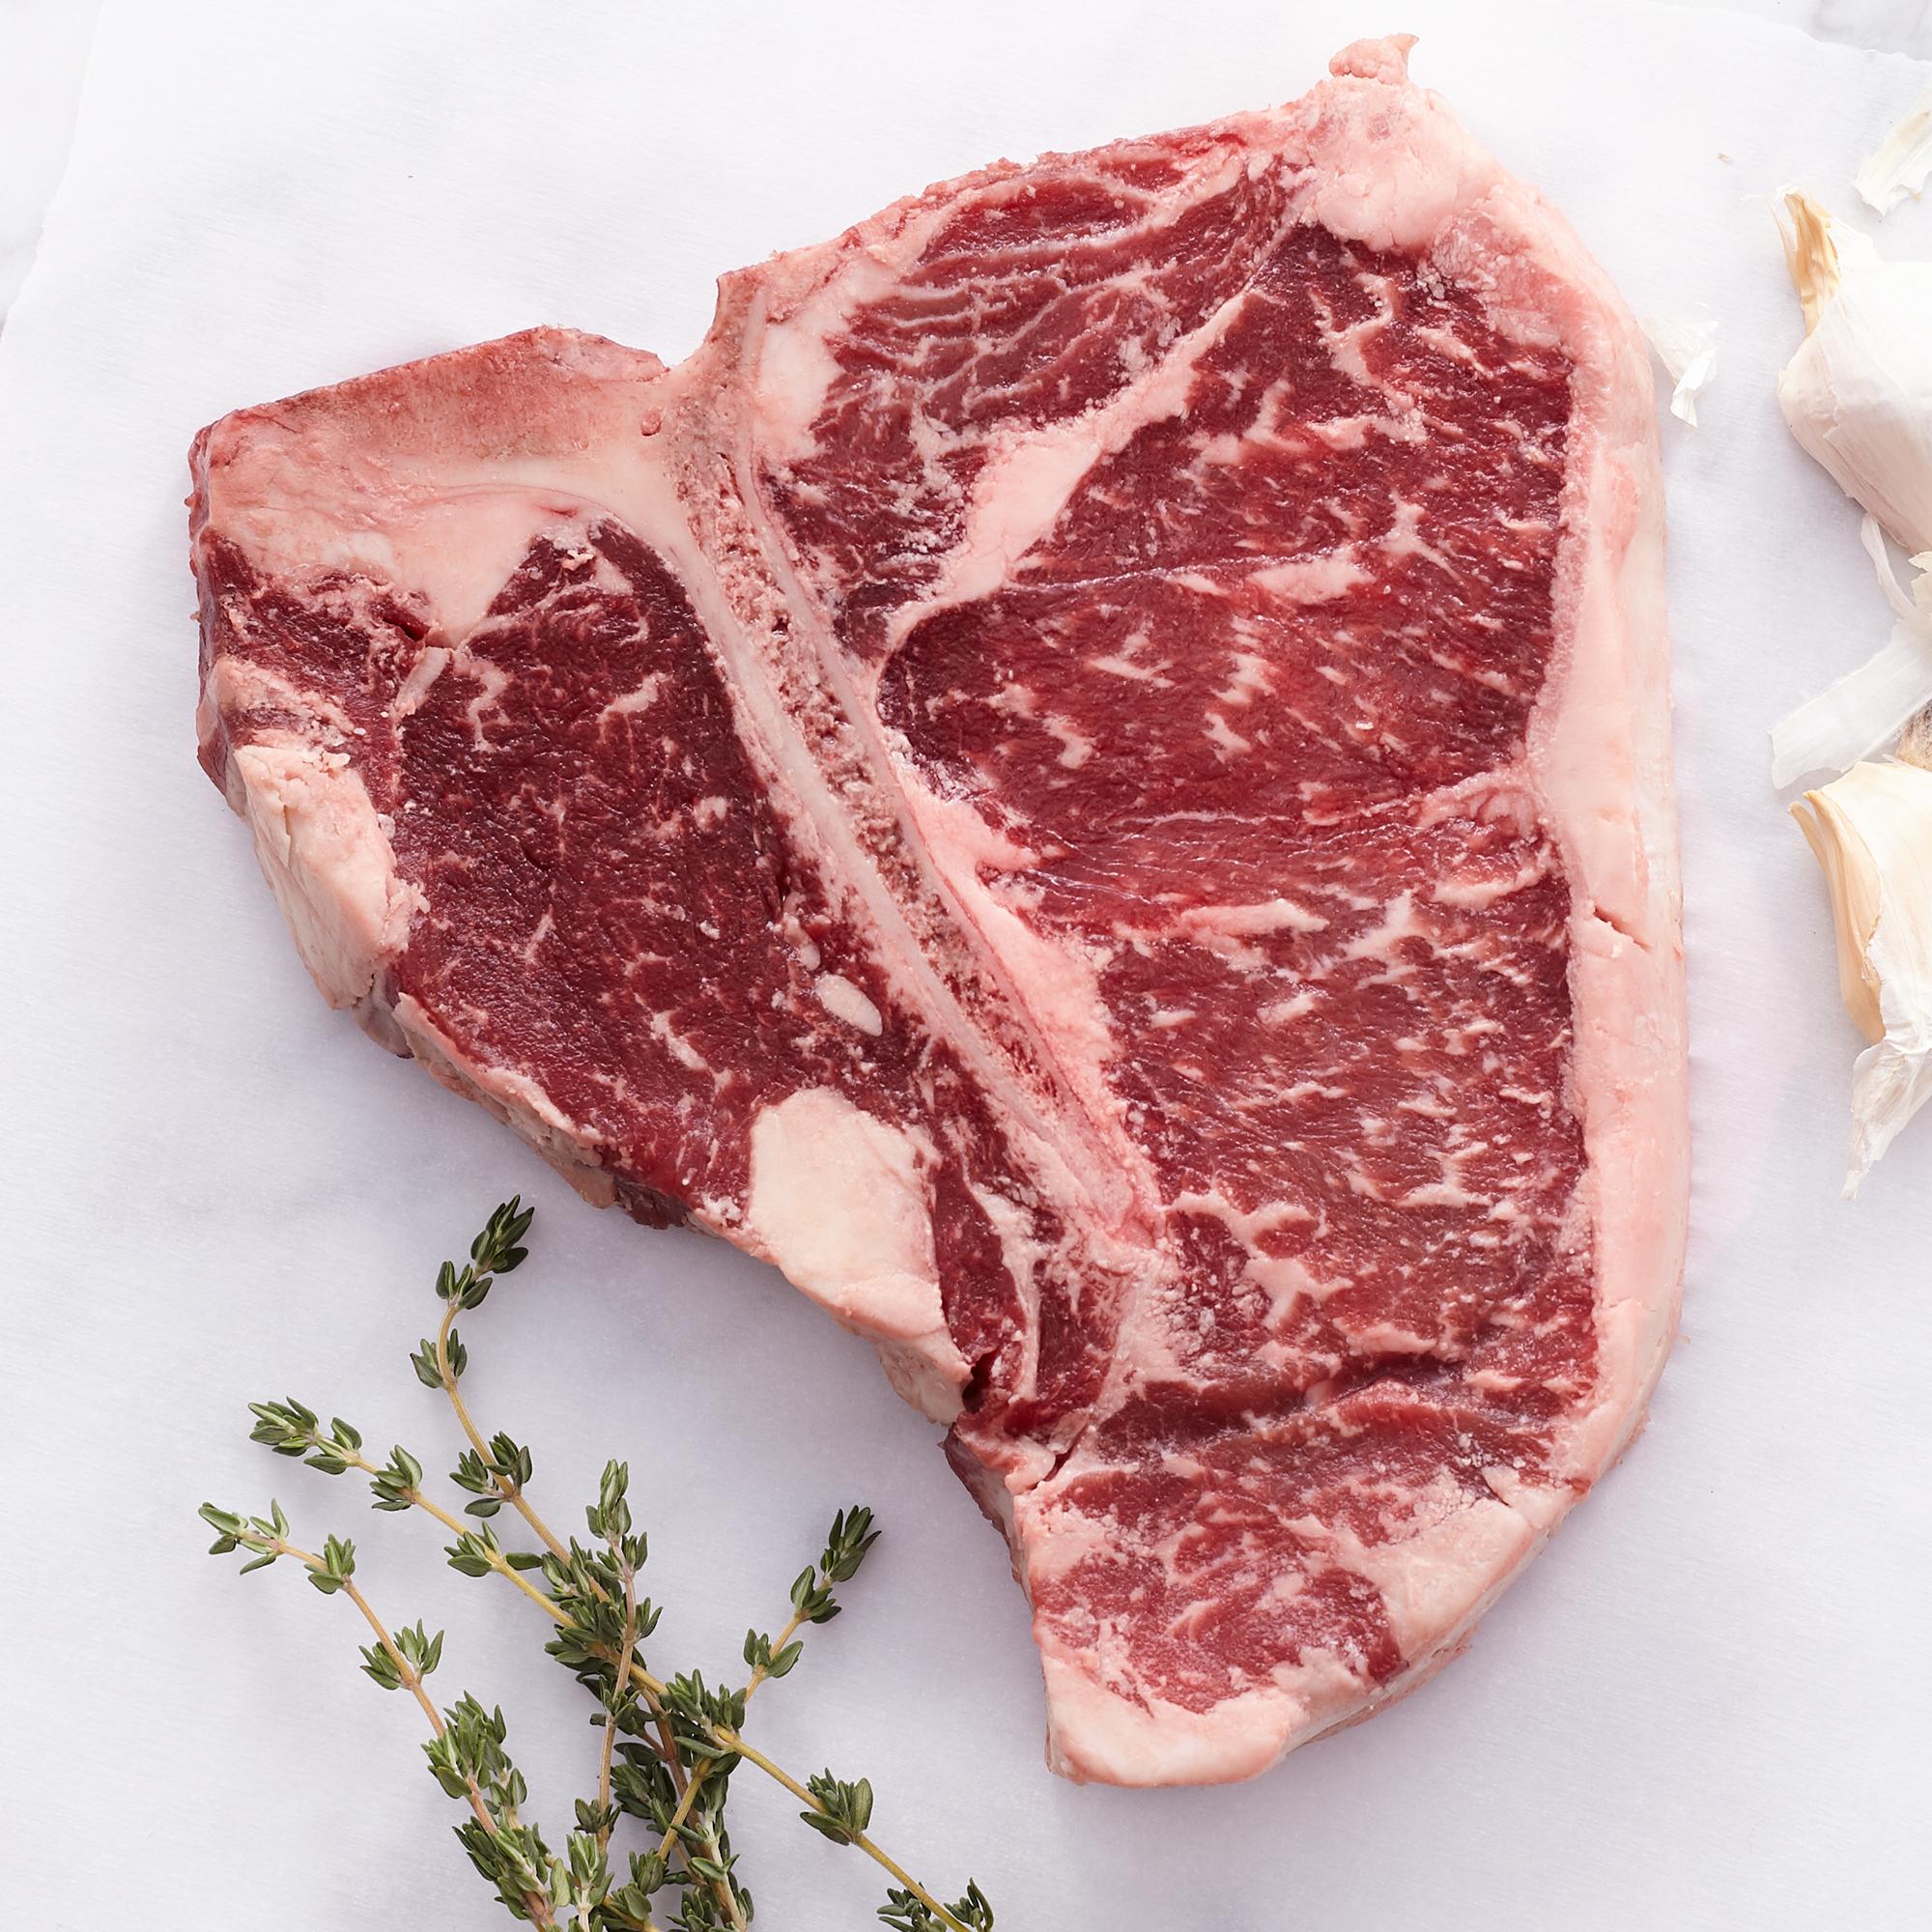 (4) 16 oz. Porterhouse Premium Steaks - ships frozen and raw